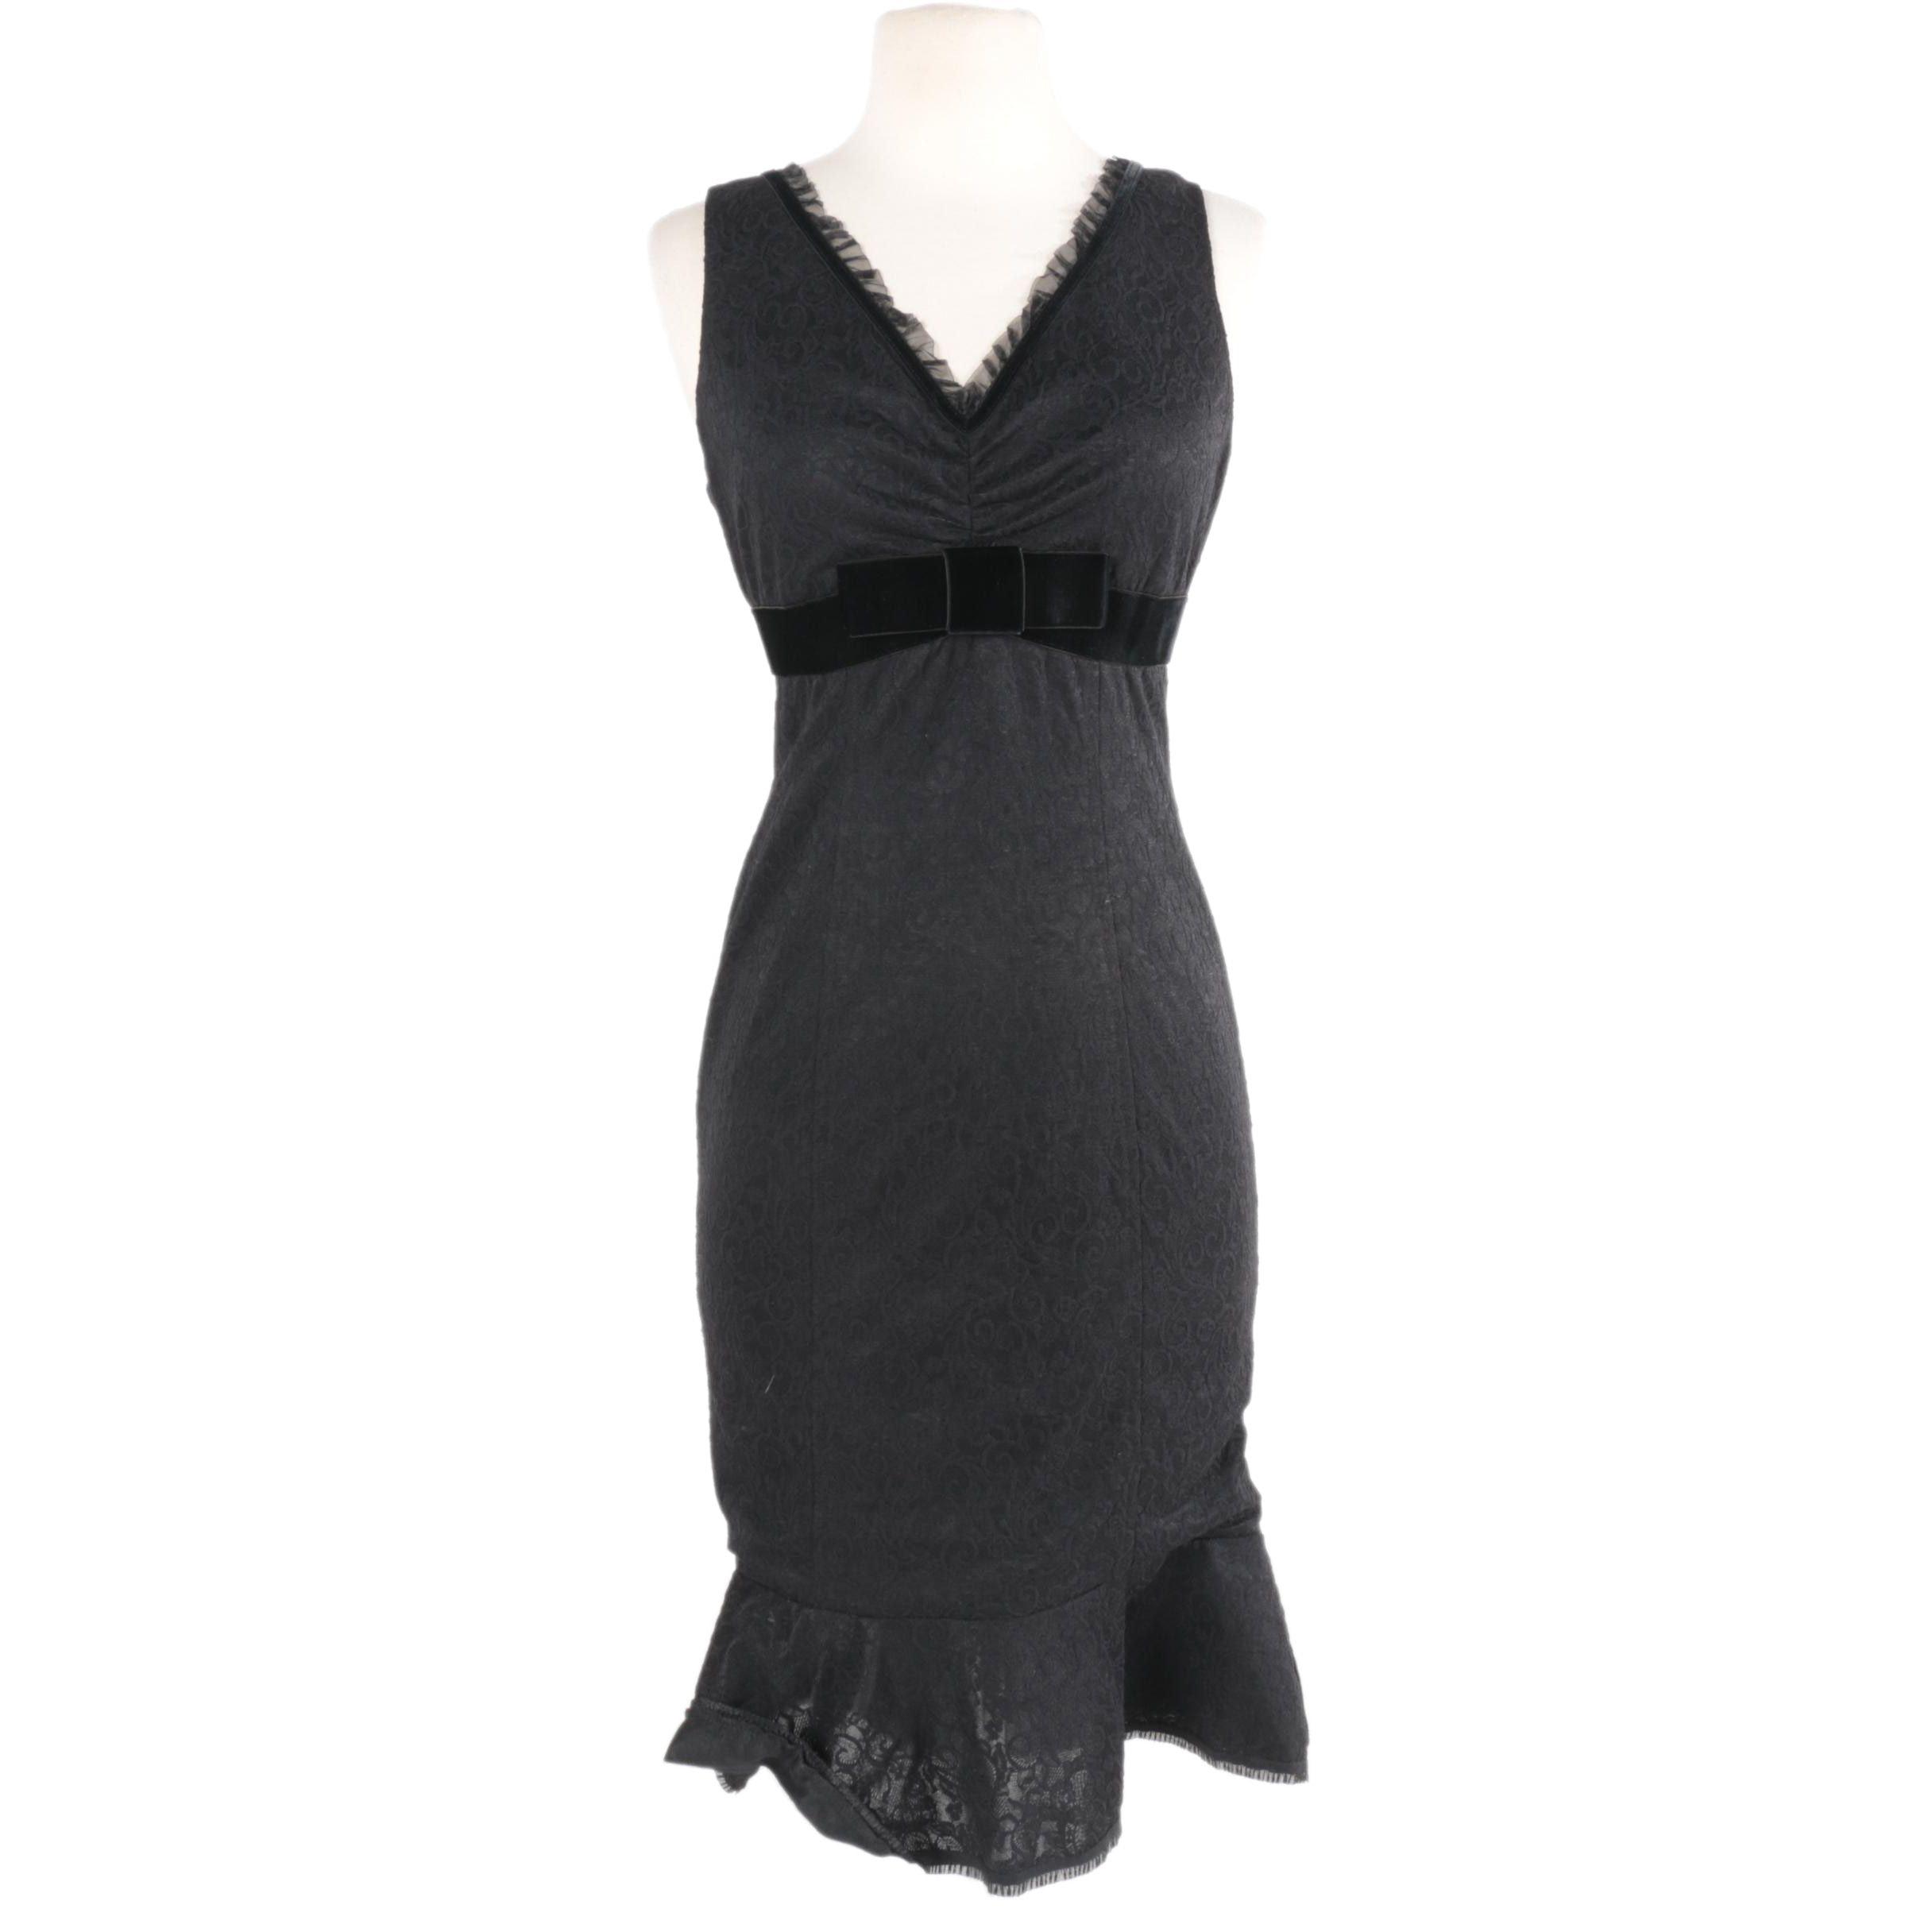 Betsey Johnson Black Dress